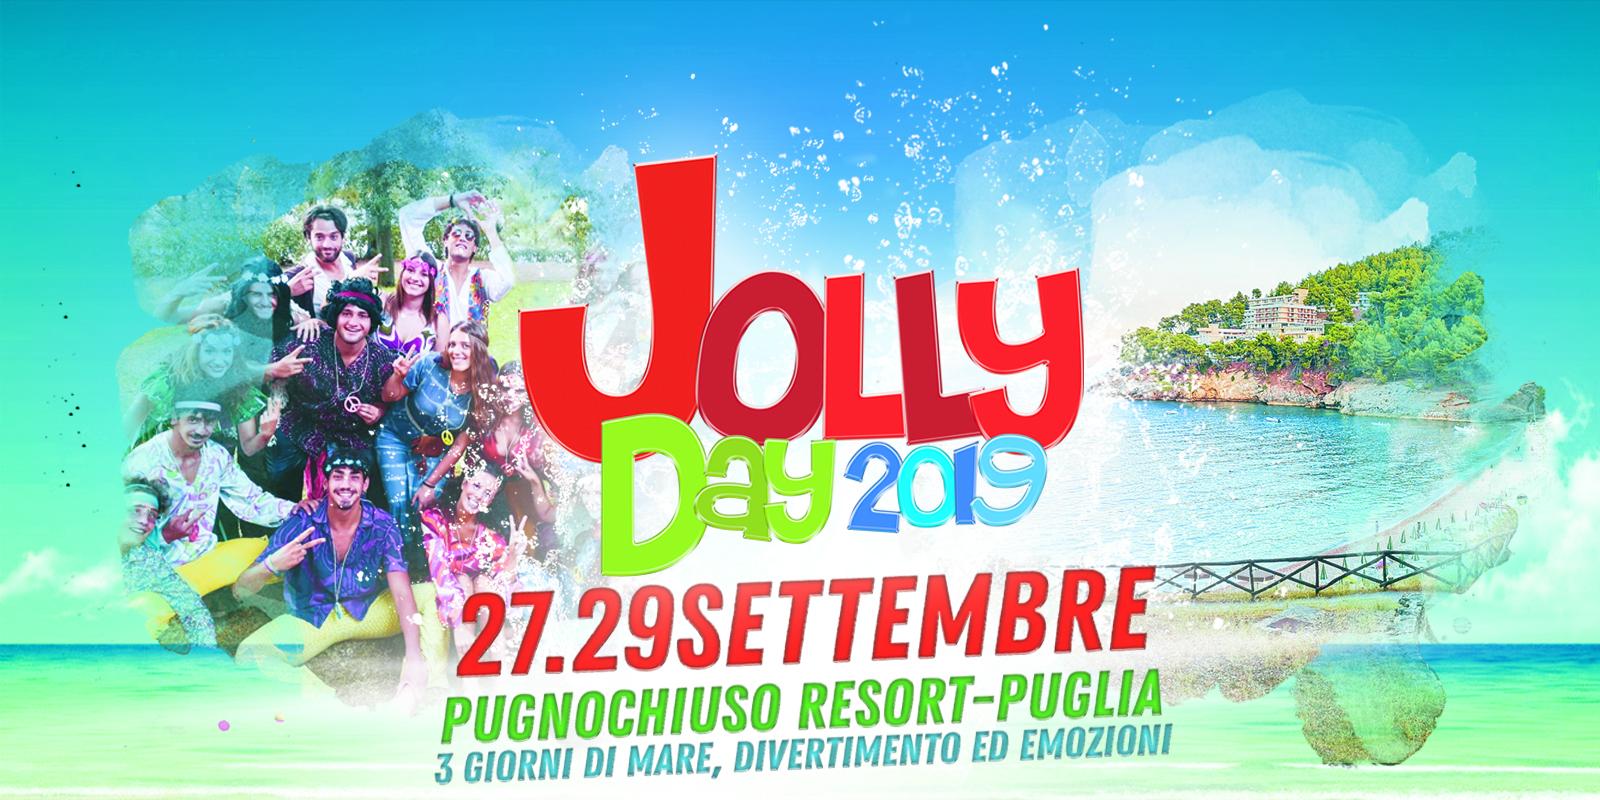 jolly day 2019